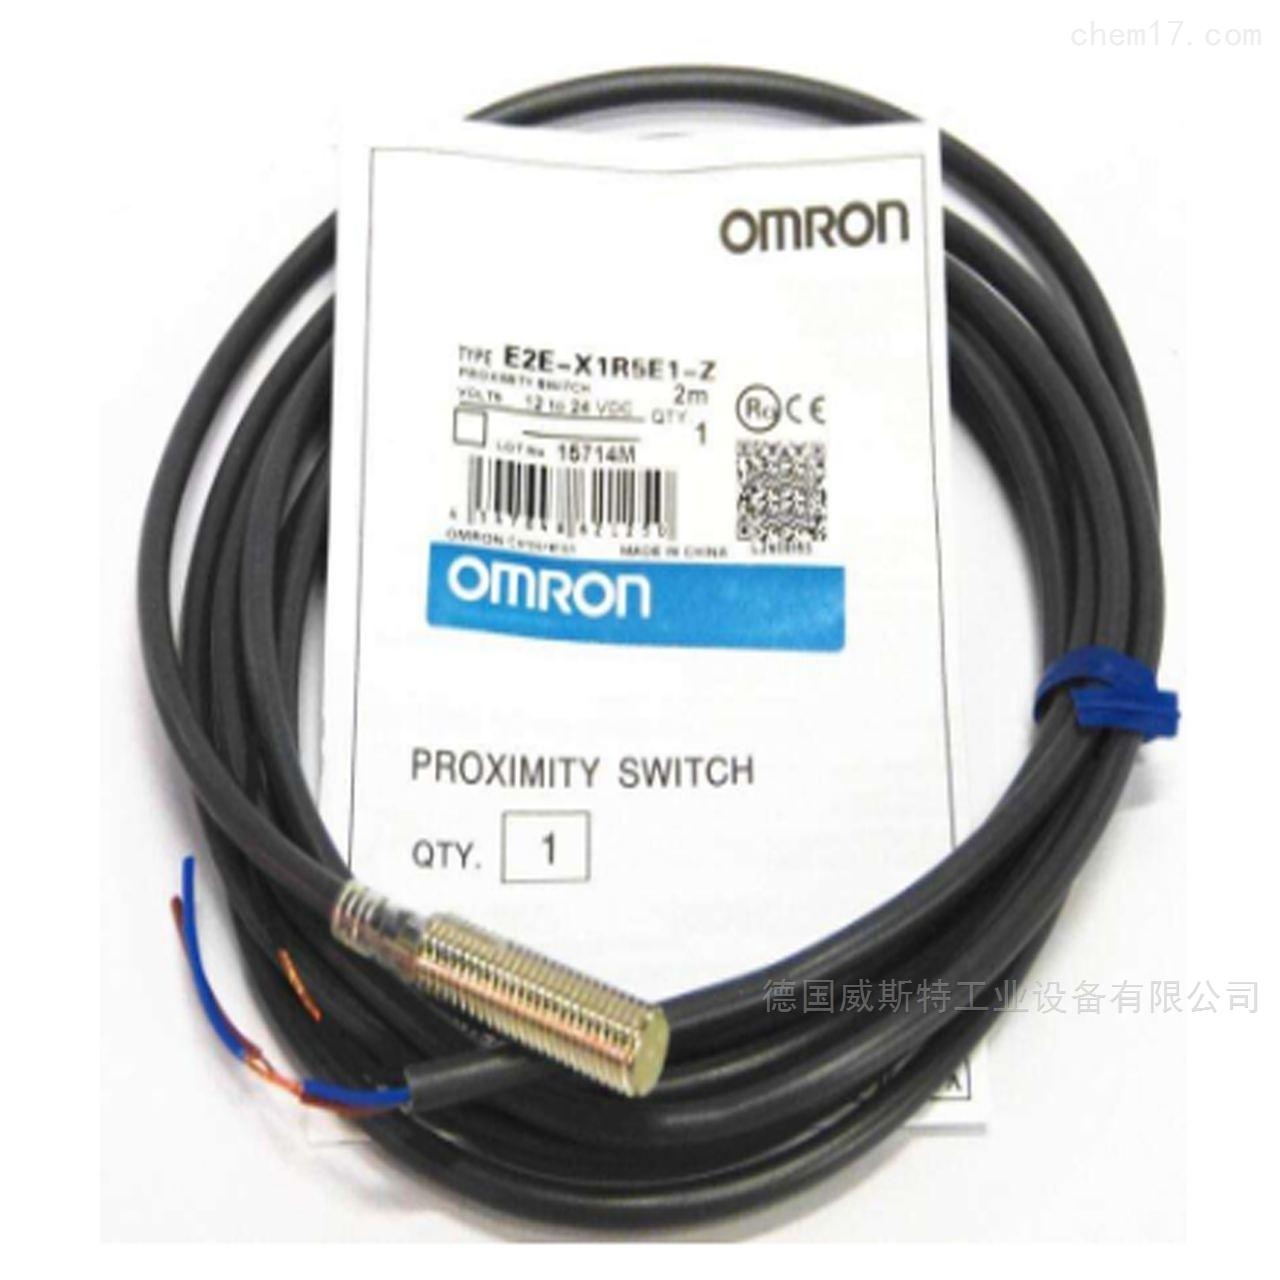 OMRON欧姆龙E2E-X1R5F2接近开关